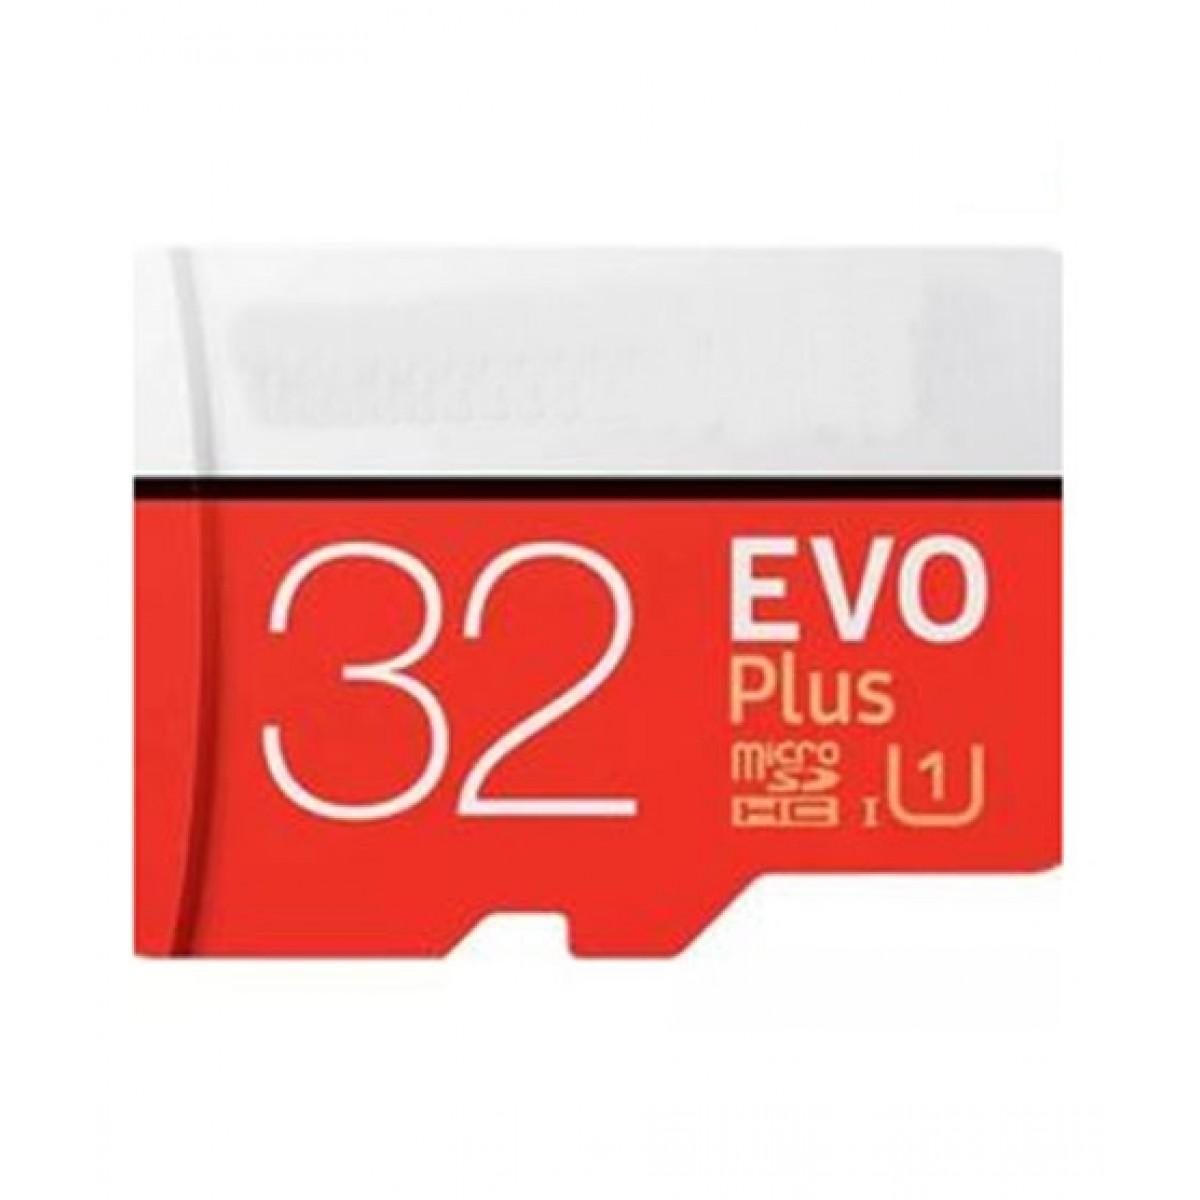 Eomobiles 32GB EVO Plus microSD Memory Card